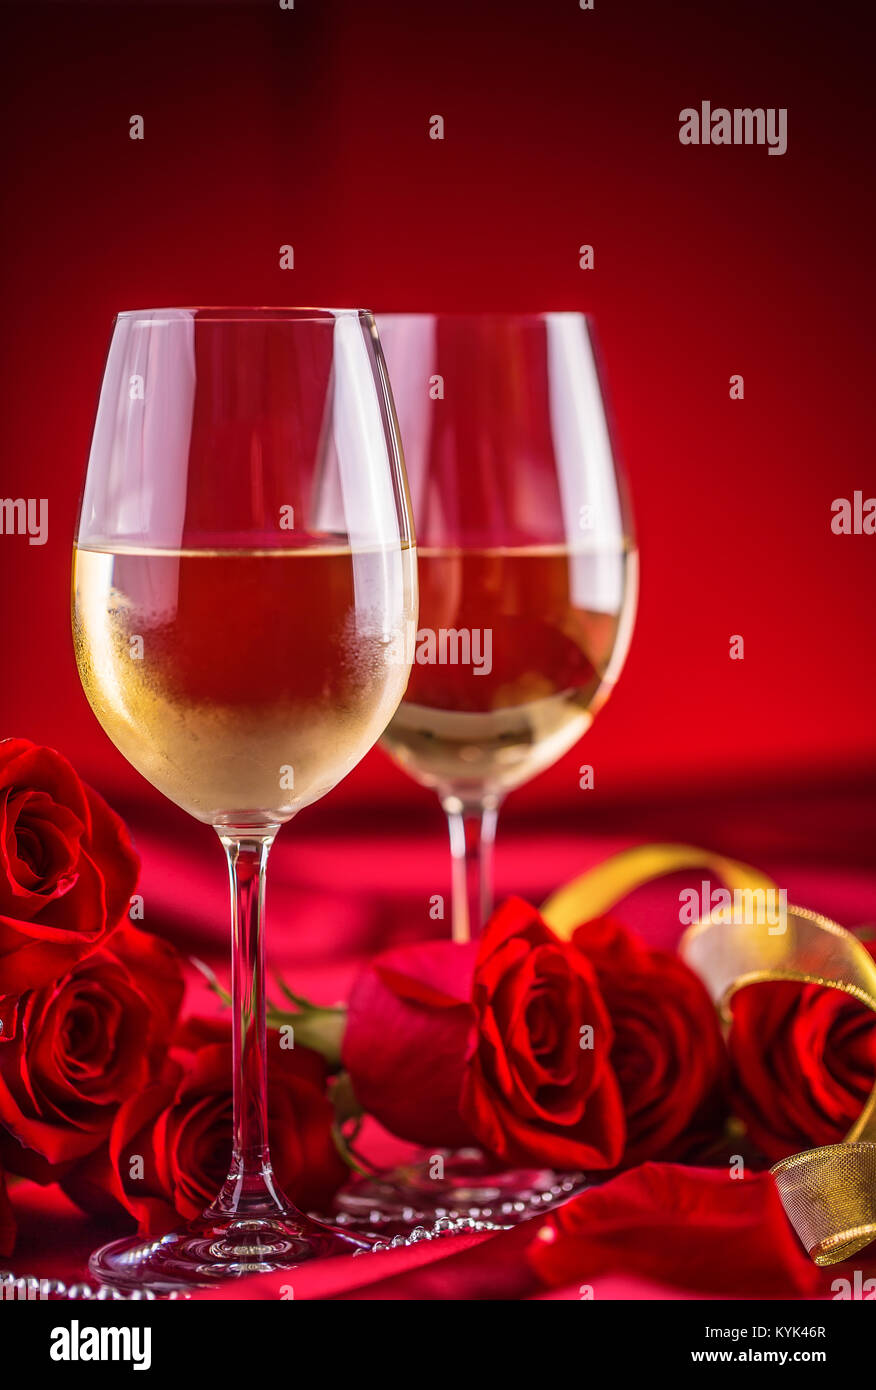 Anniversario Matrimonio Auguri Romantici : Valentines o il concetto di matrimonio. bicchieri di vino rose rosse